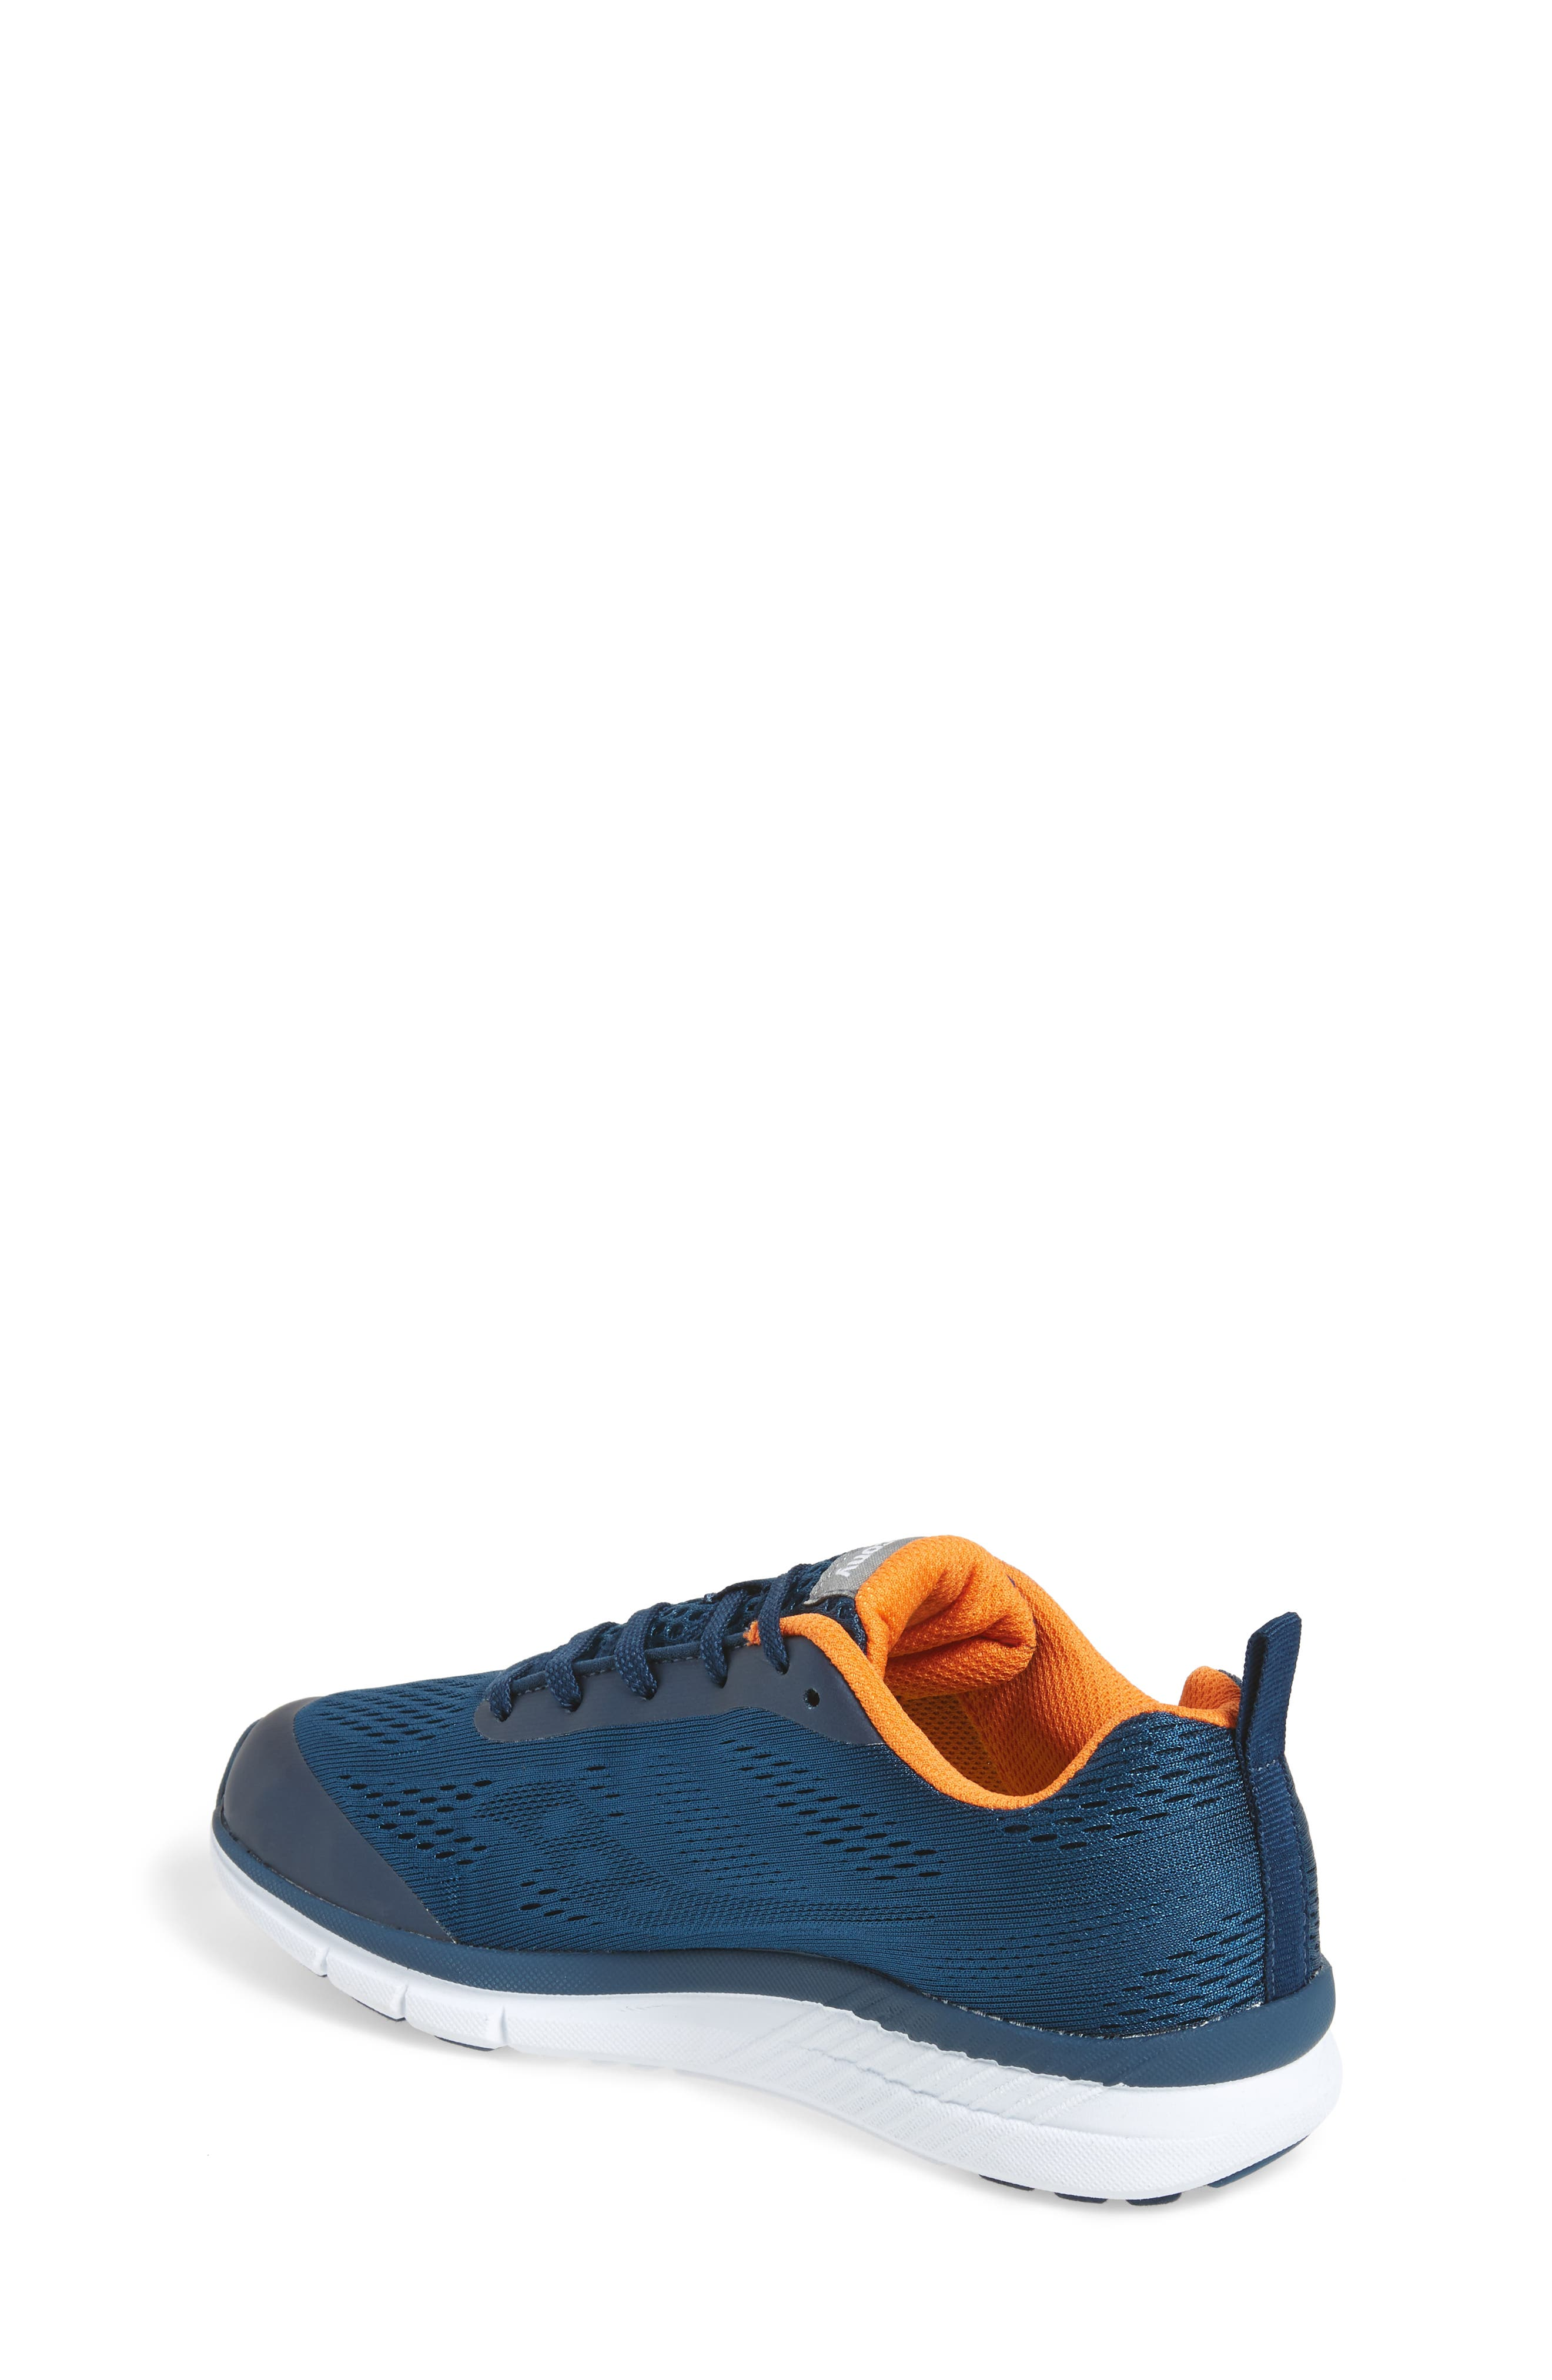 Ideal Sneaker,                             Alternate thumbnail 2, color,                             410